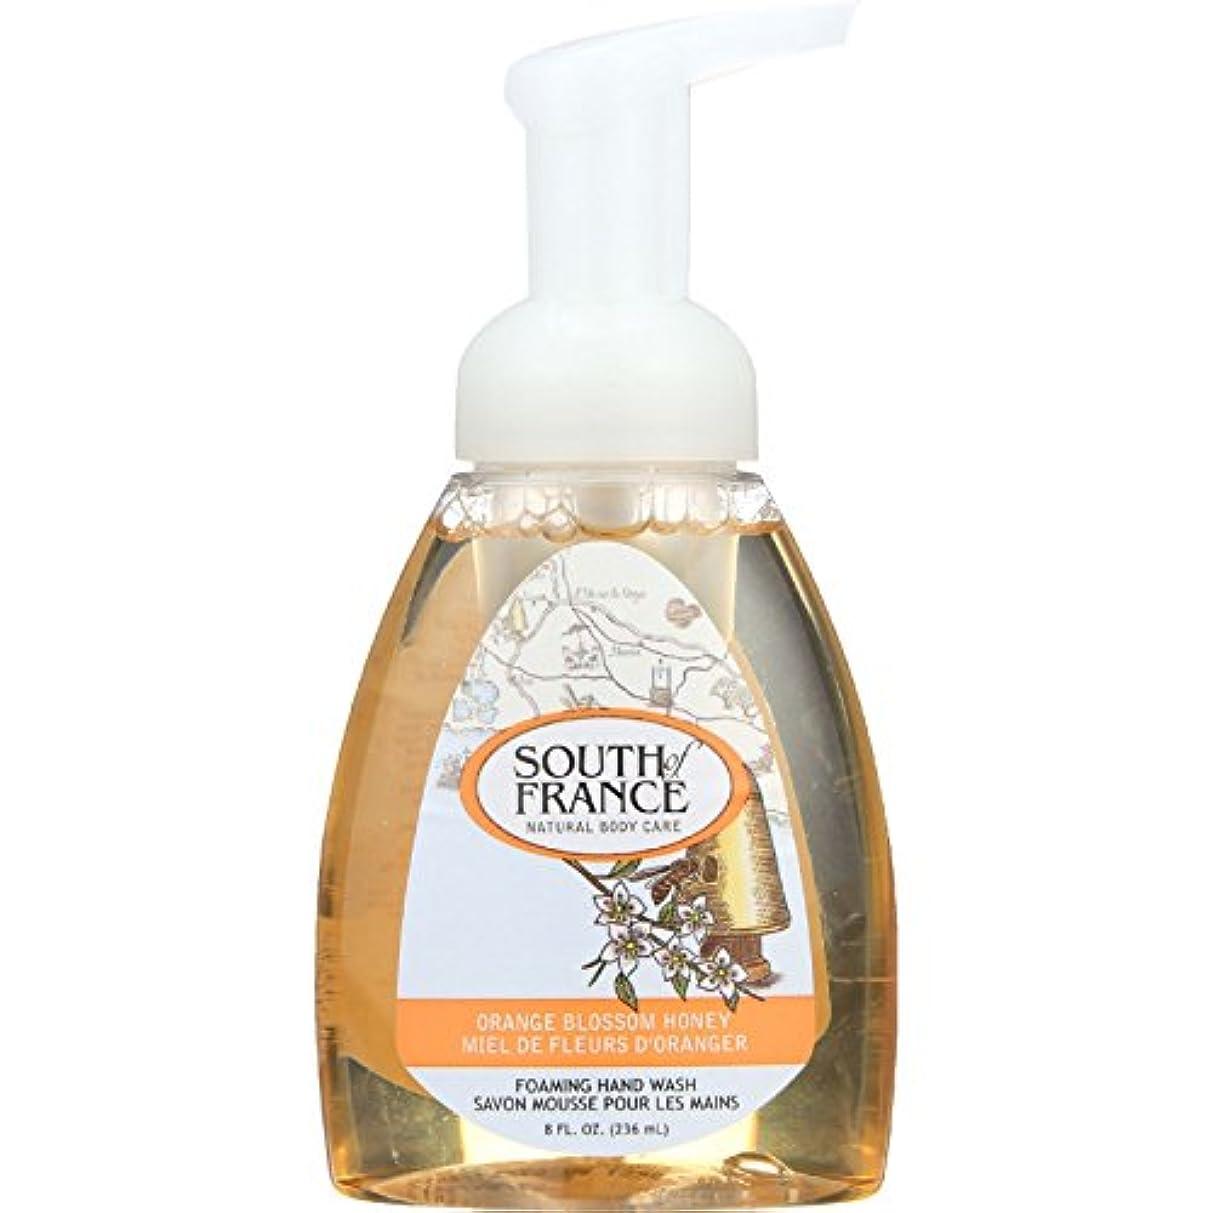 Hand Soap - Foaming - Orange Blossom Honey - 8 oz - 1 each by South Of France